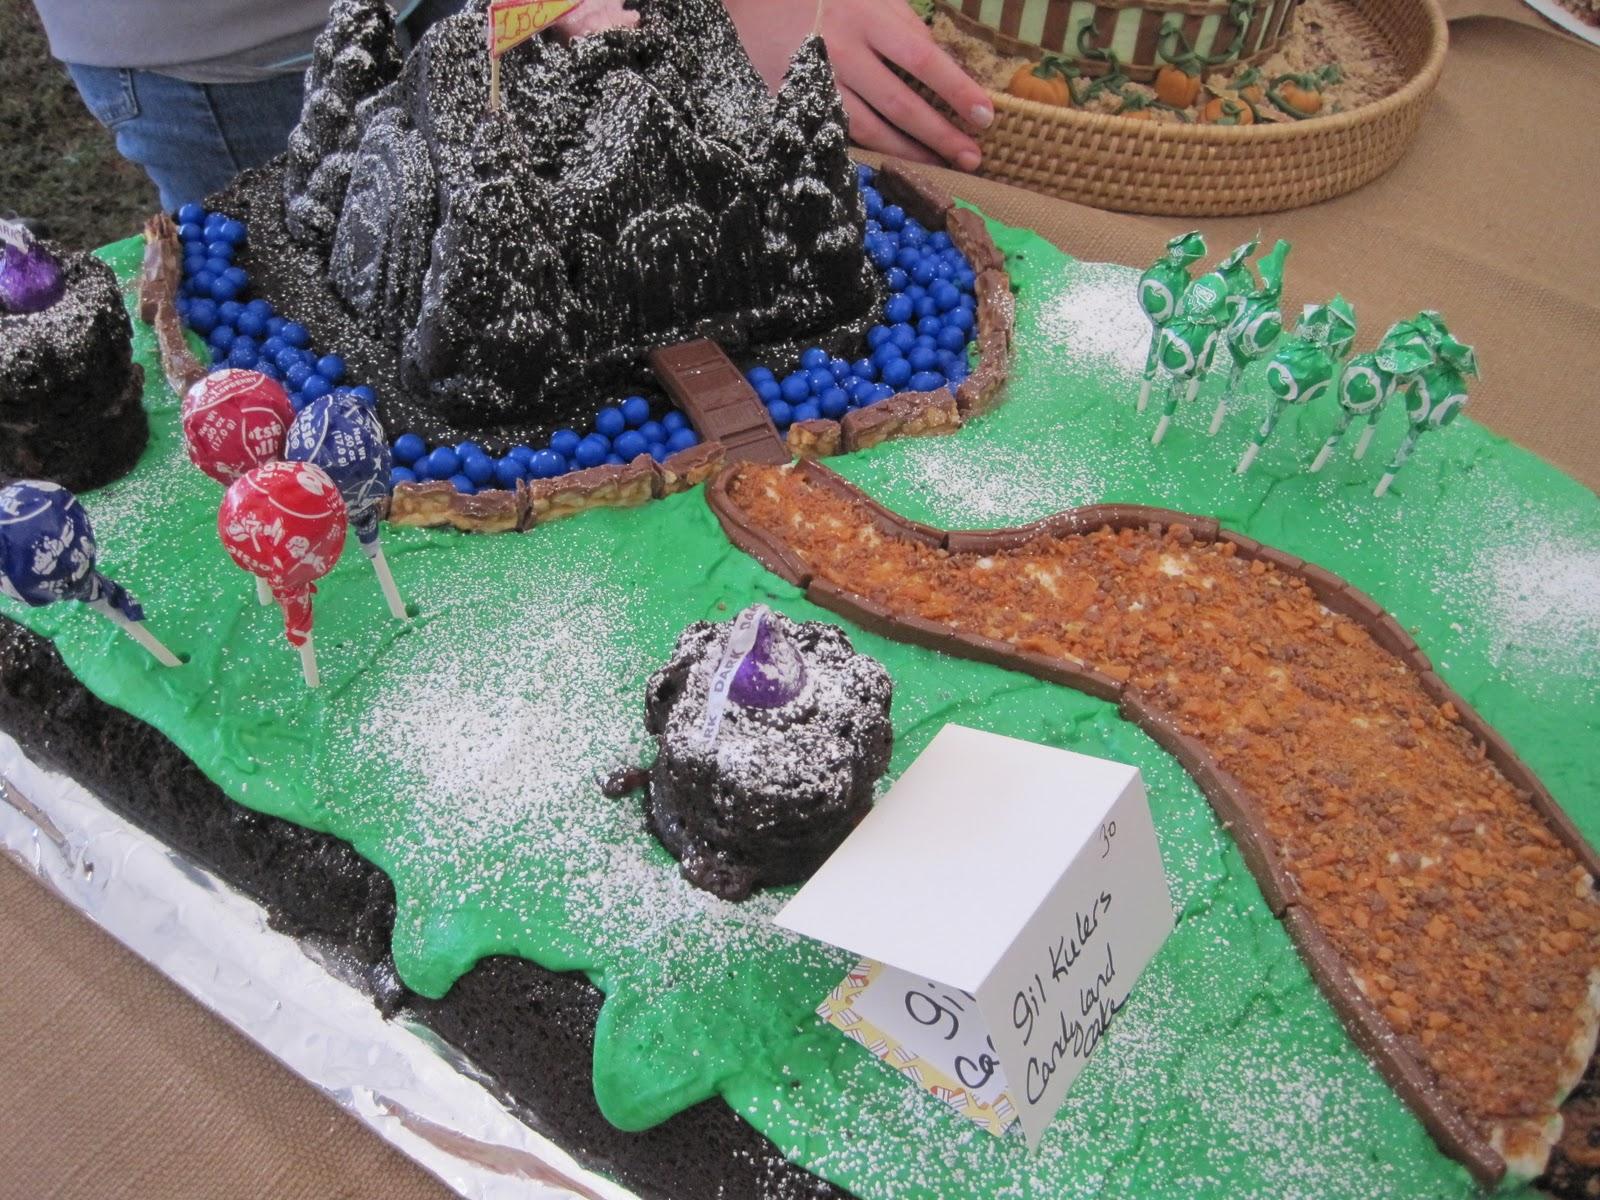 Dawne raulet wedding cakes